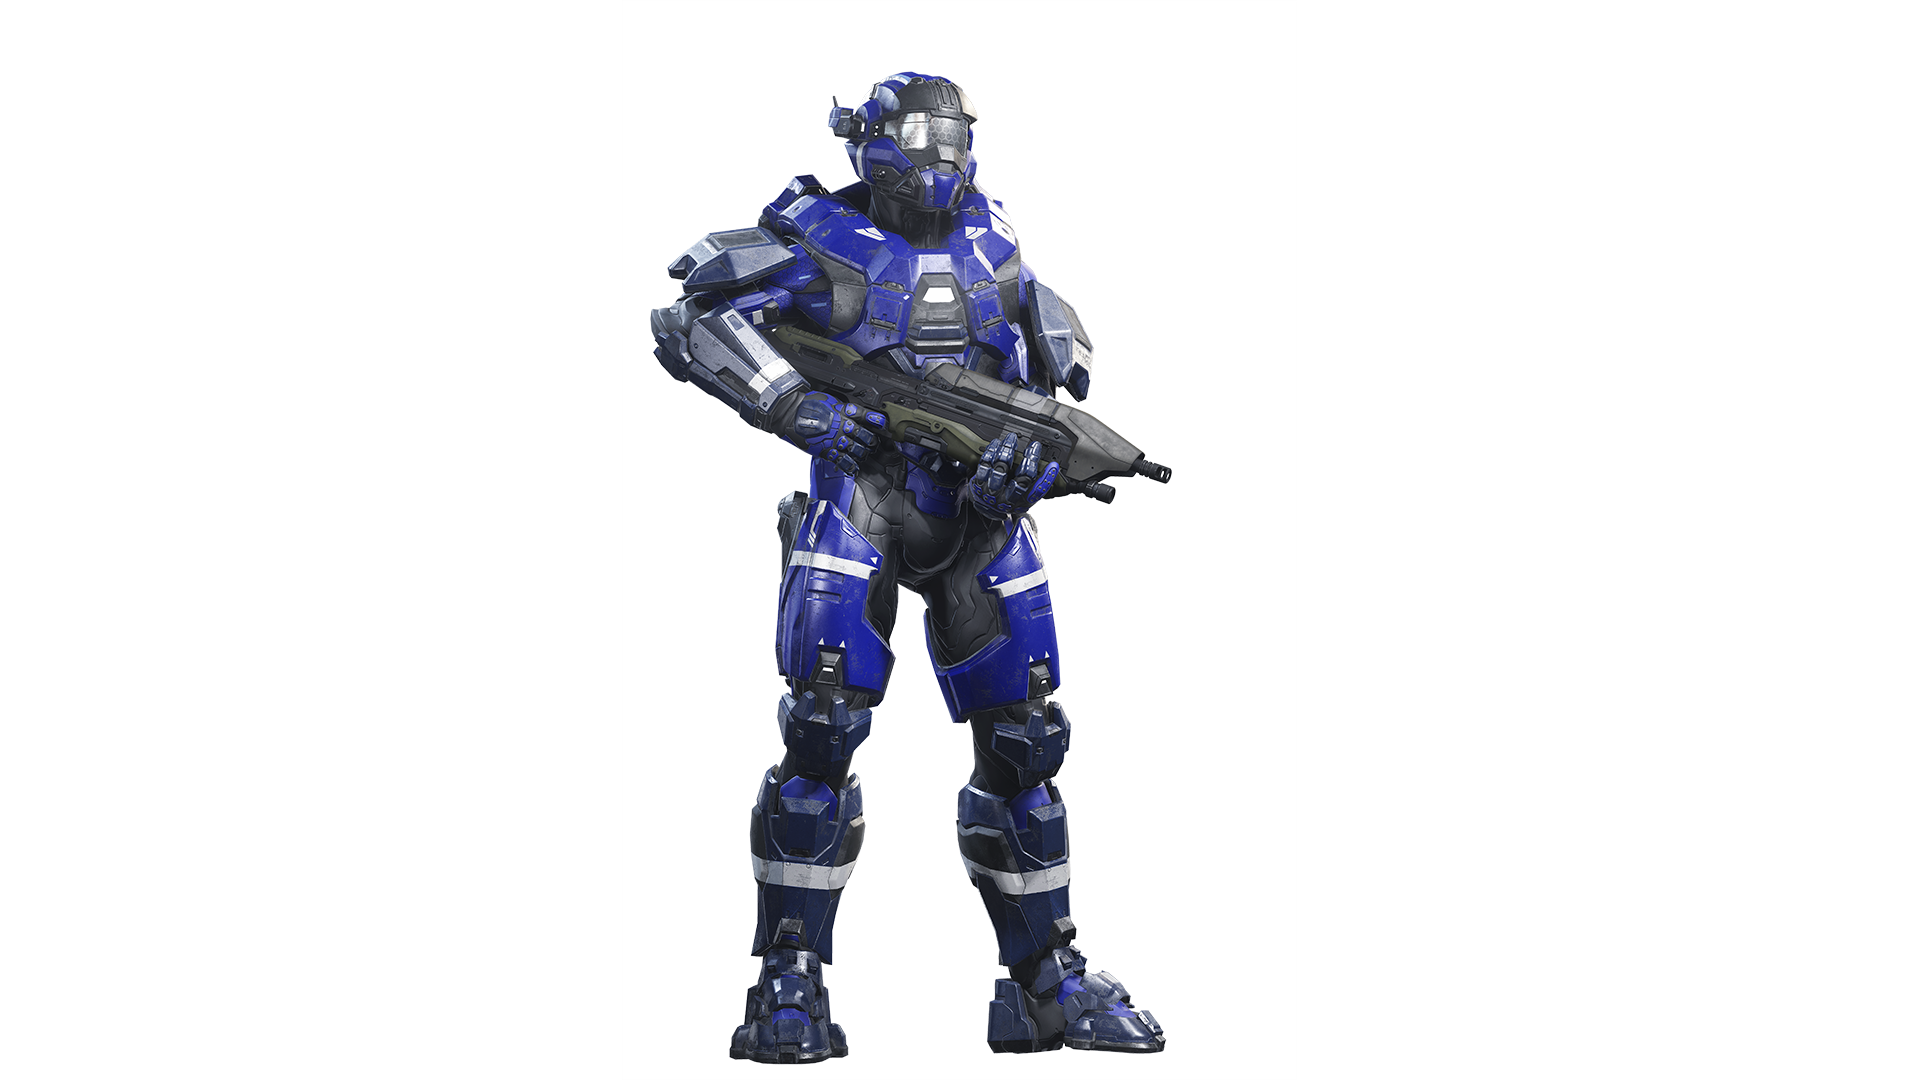 h5-guardians-render-noble-blue-680e2d469dd248a5a57ed09afd81ba59.png